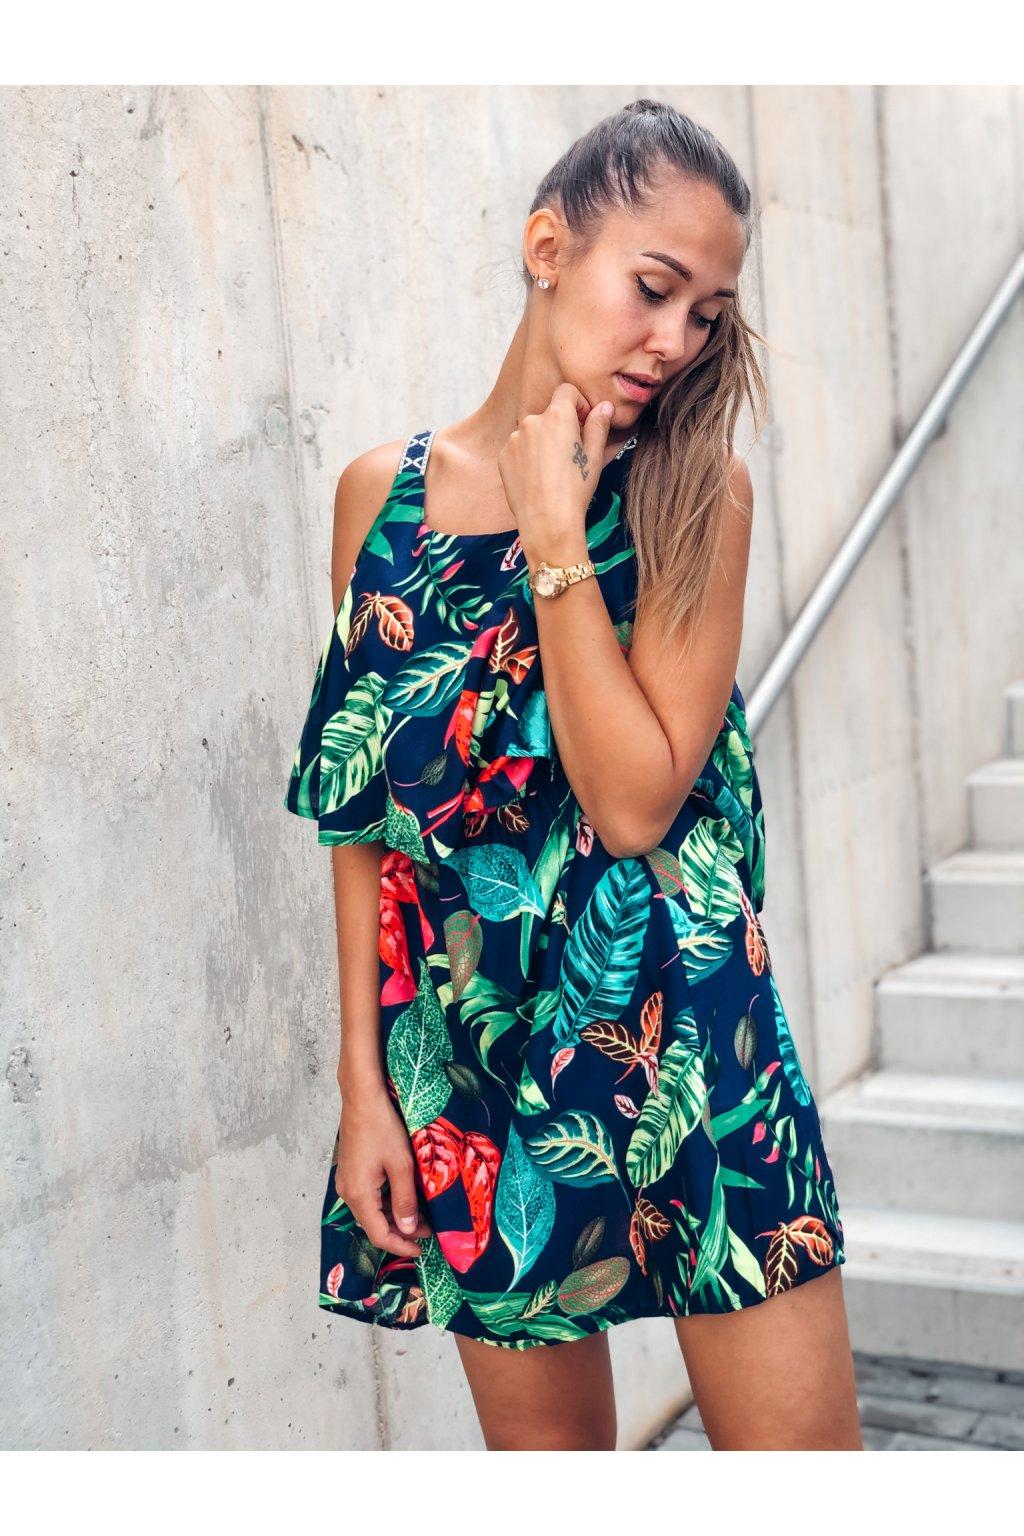 damske saty flowers navy blue eshopat cz 1